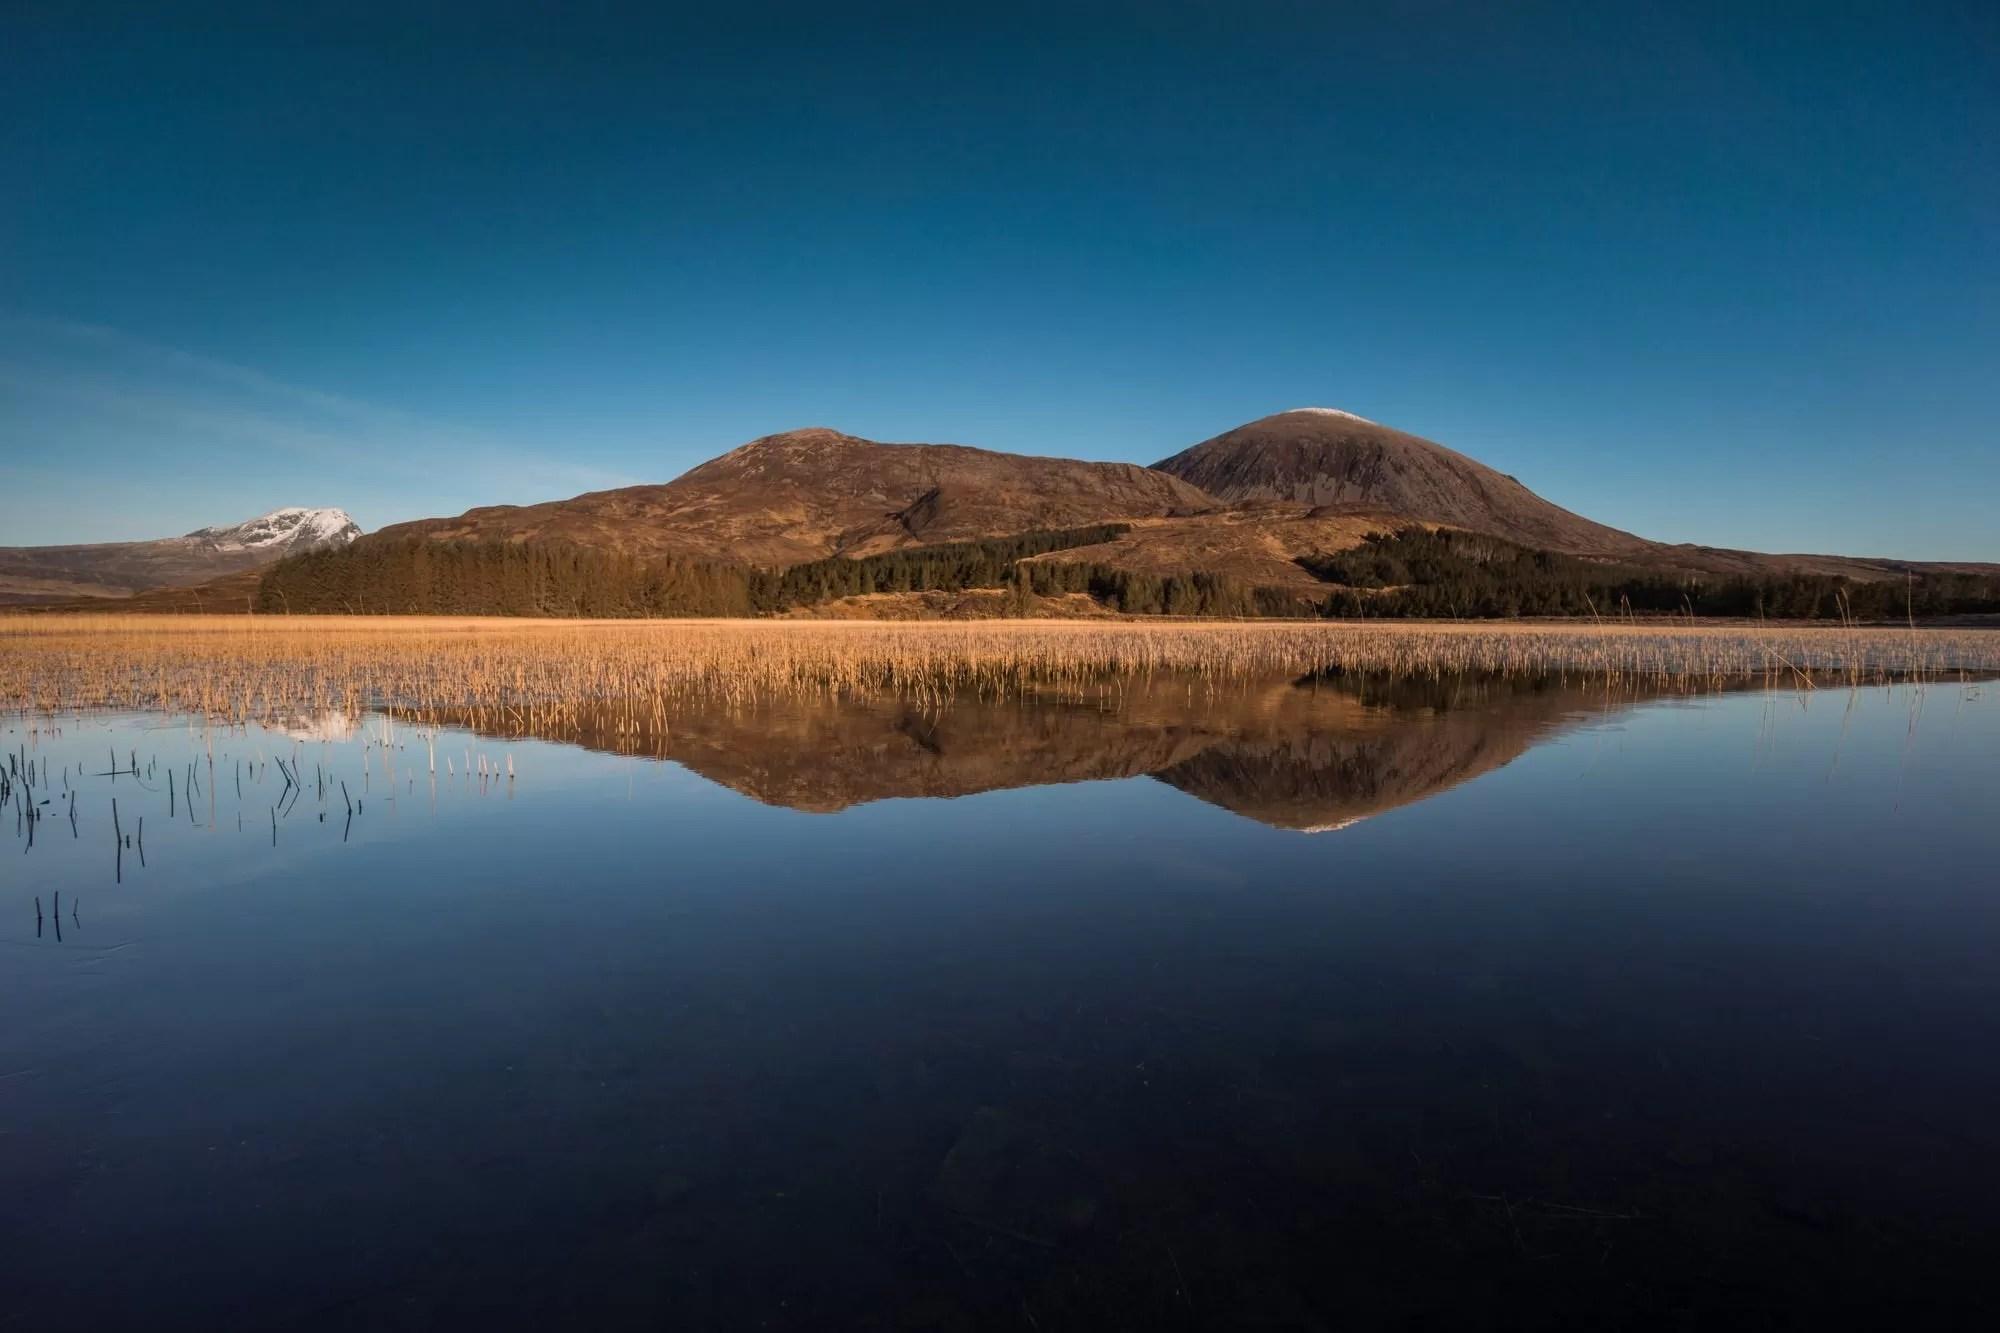 Loch Cill Chriosd Reflections - Scotland Photography